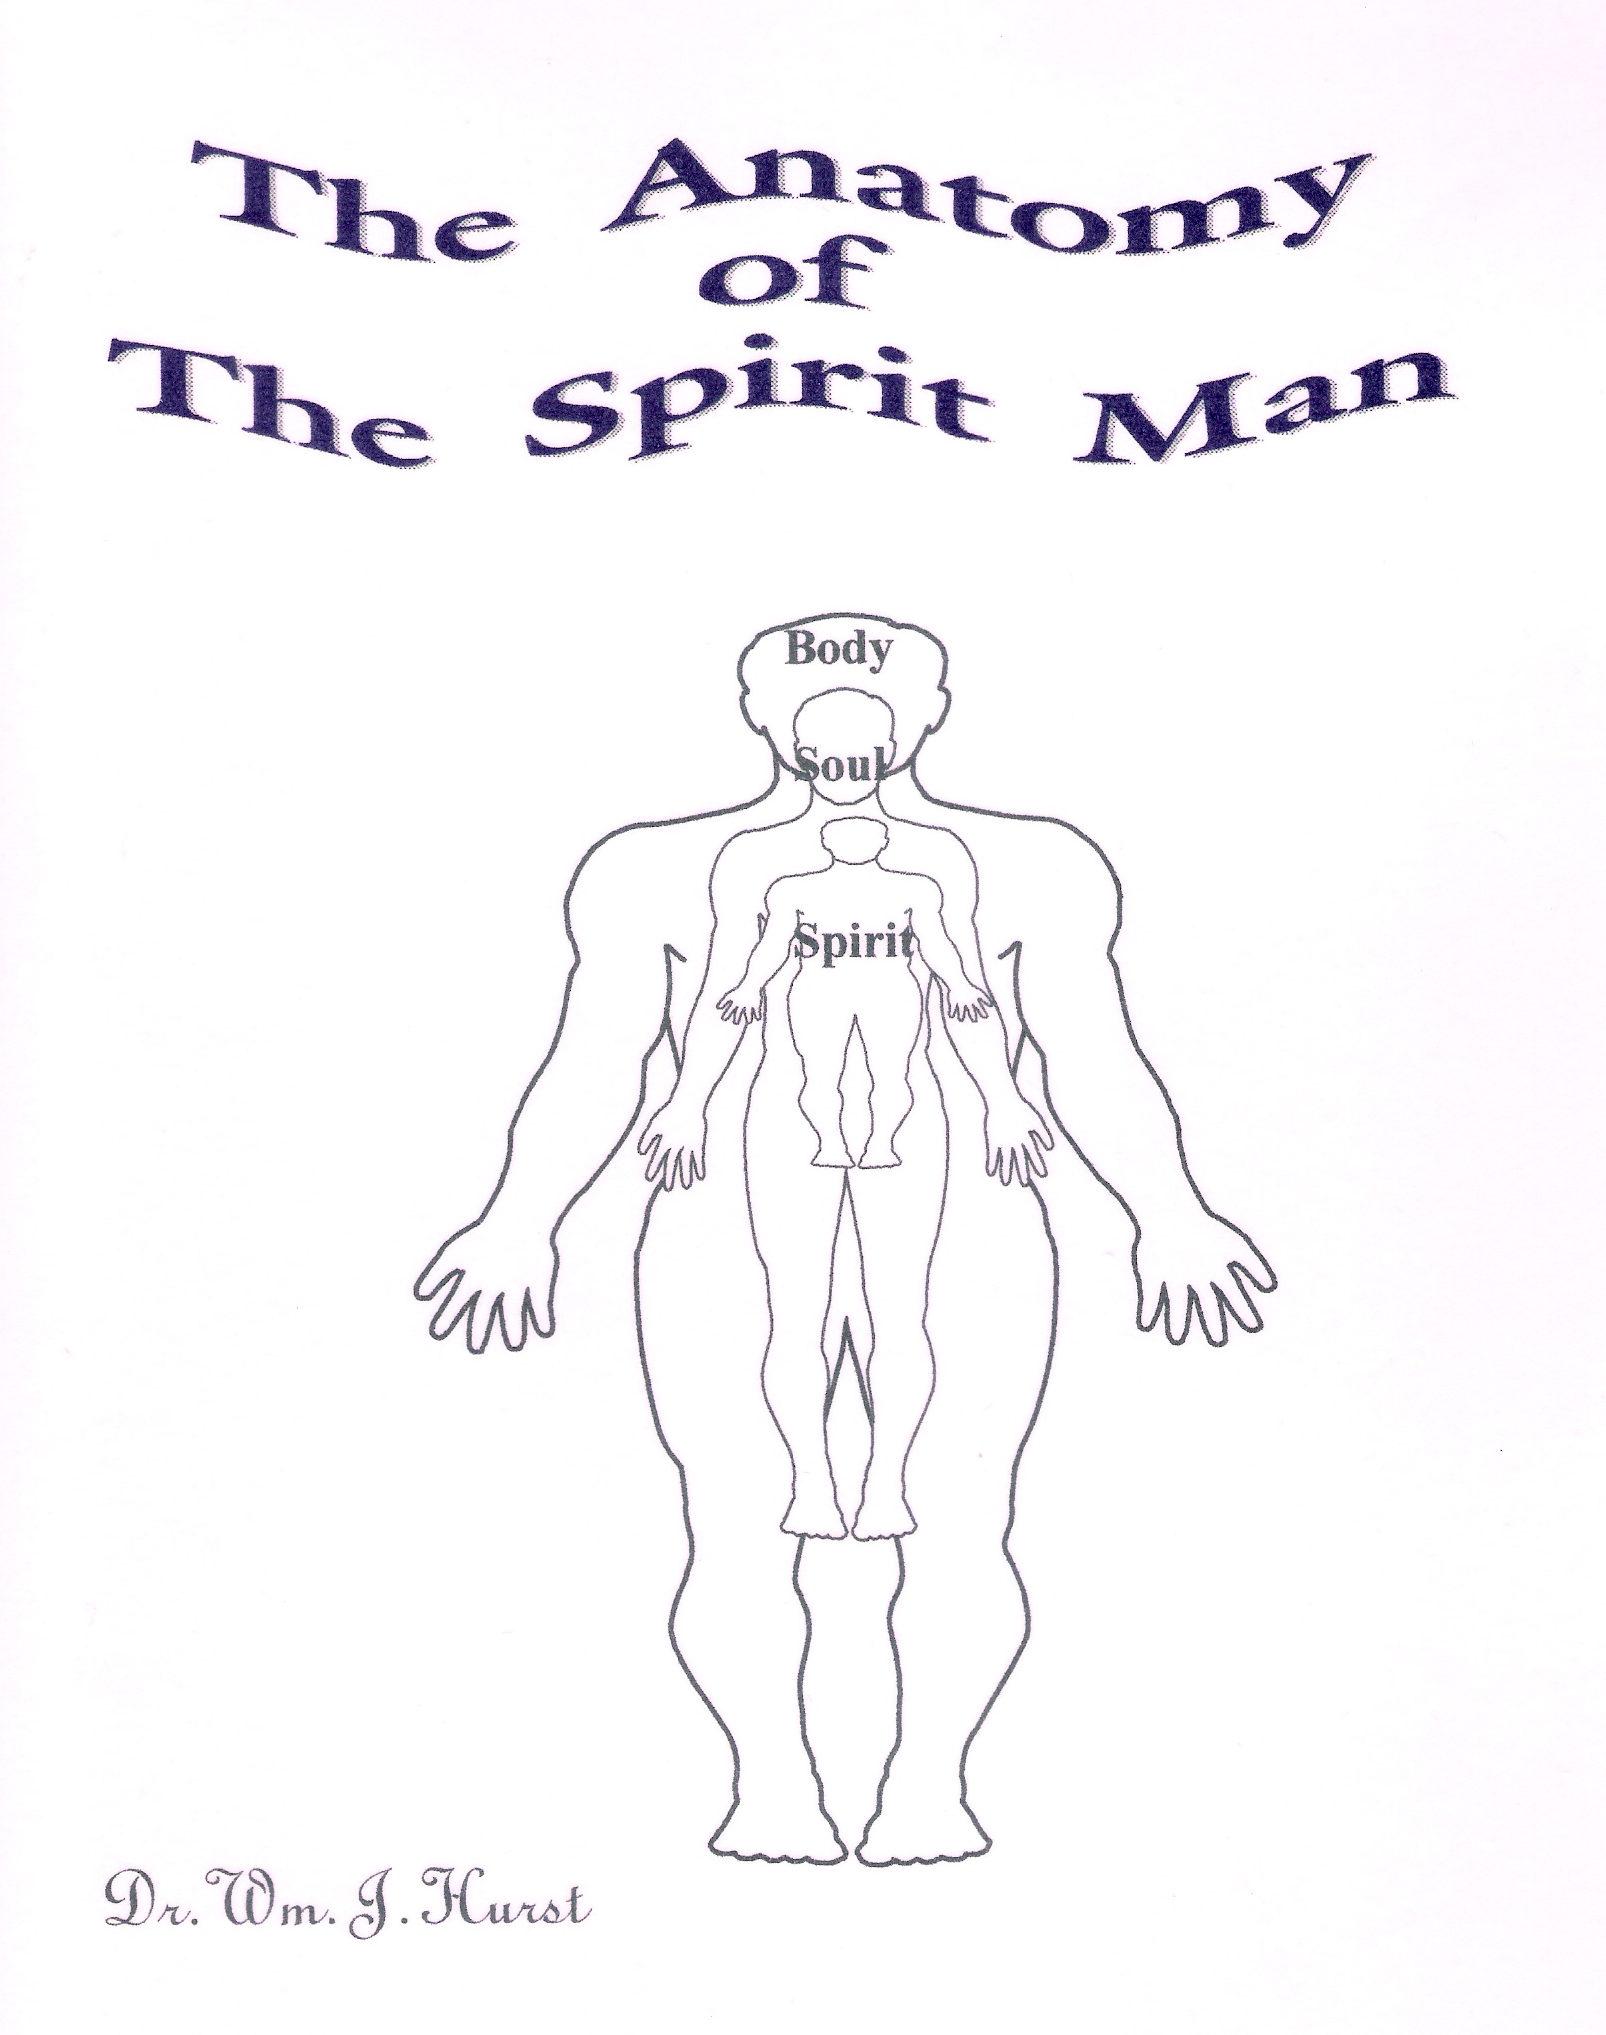 The anatomy of spirit